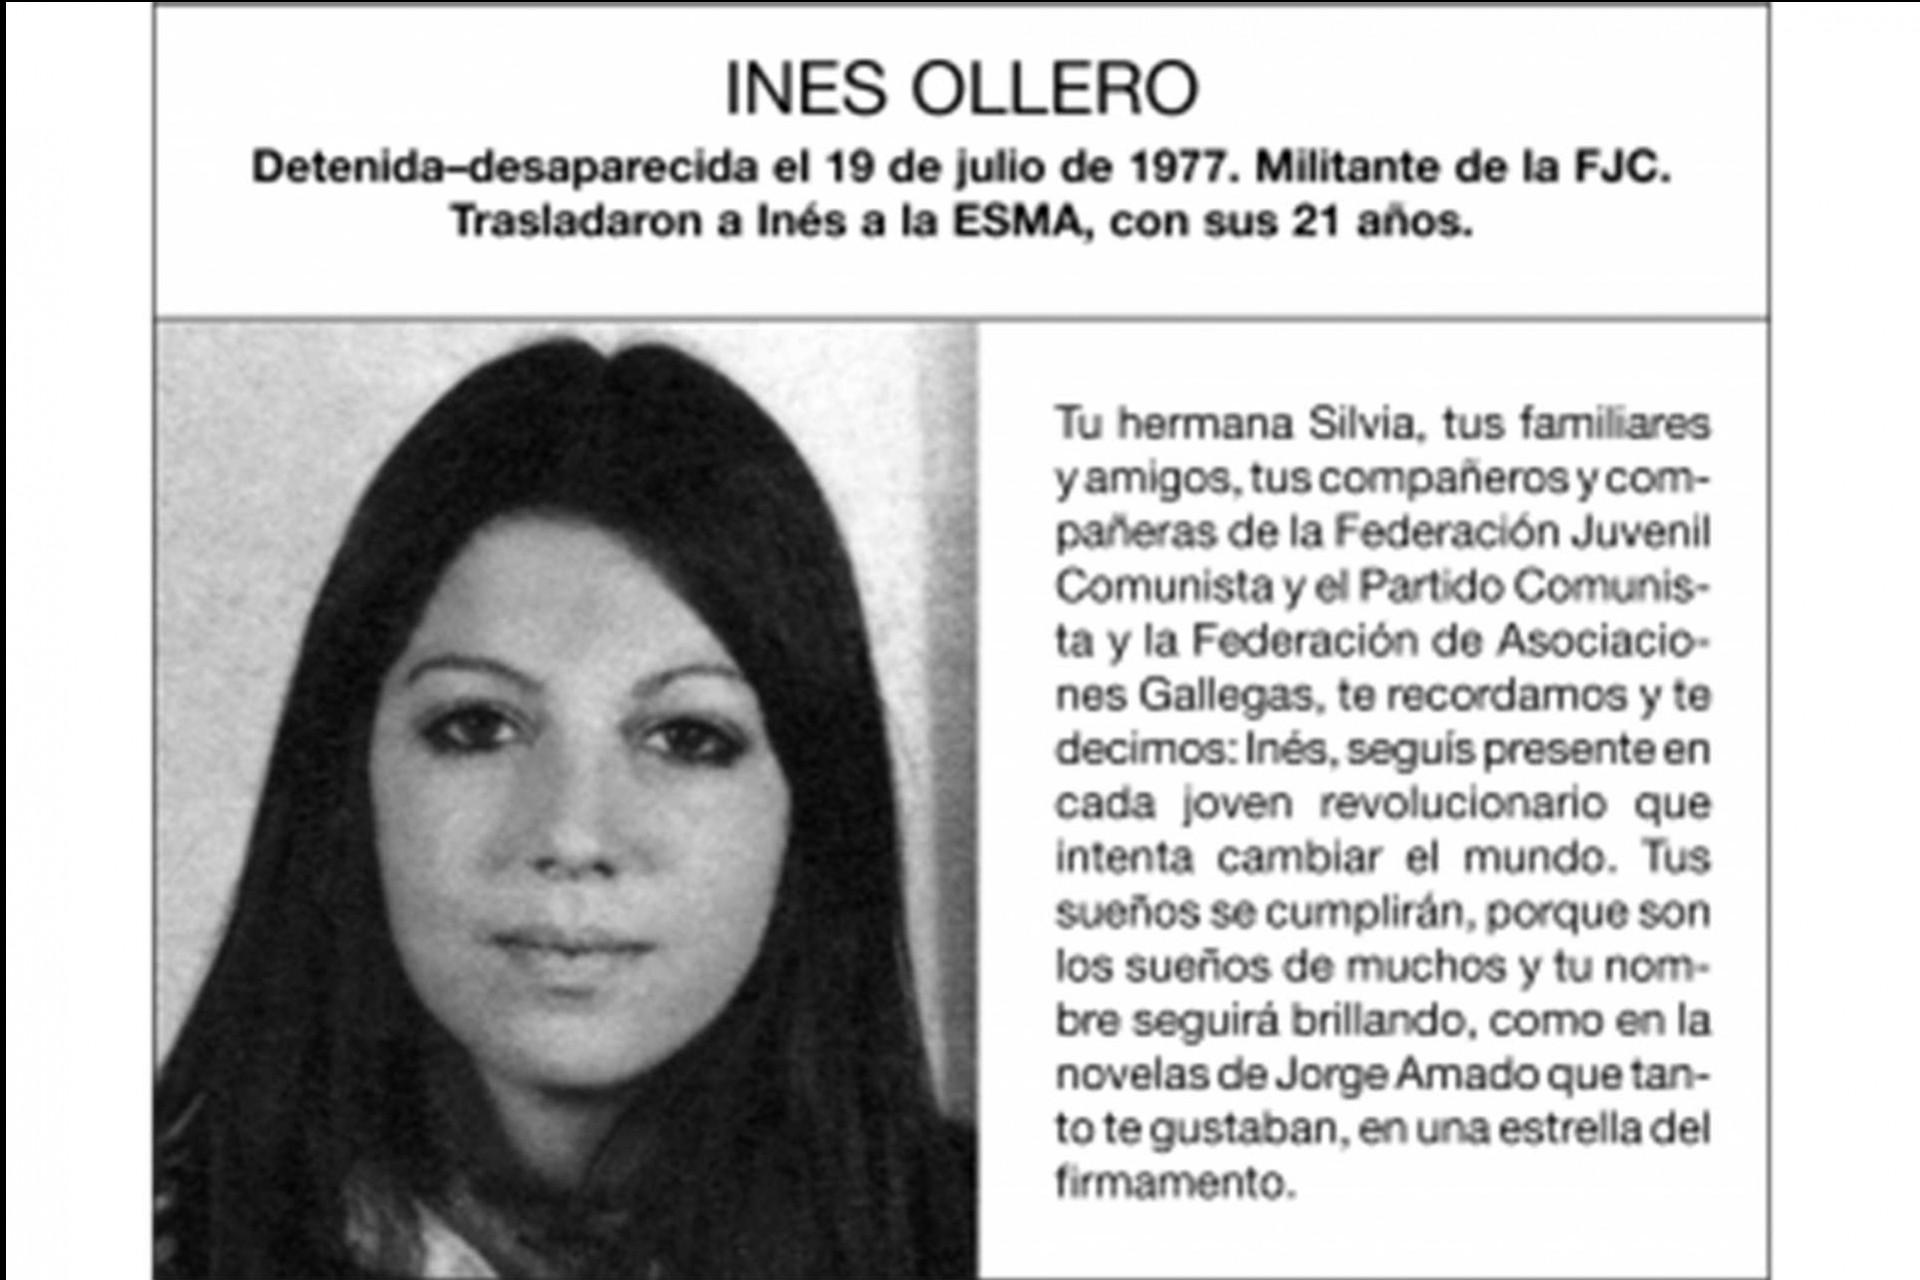 Ines Ollero